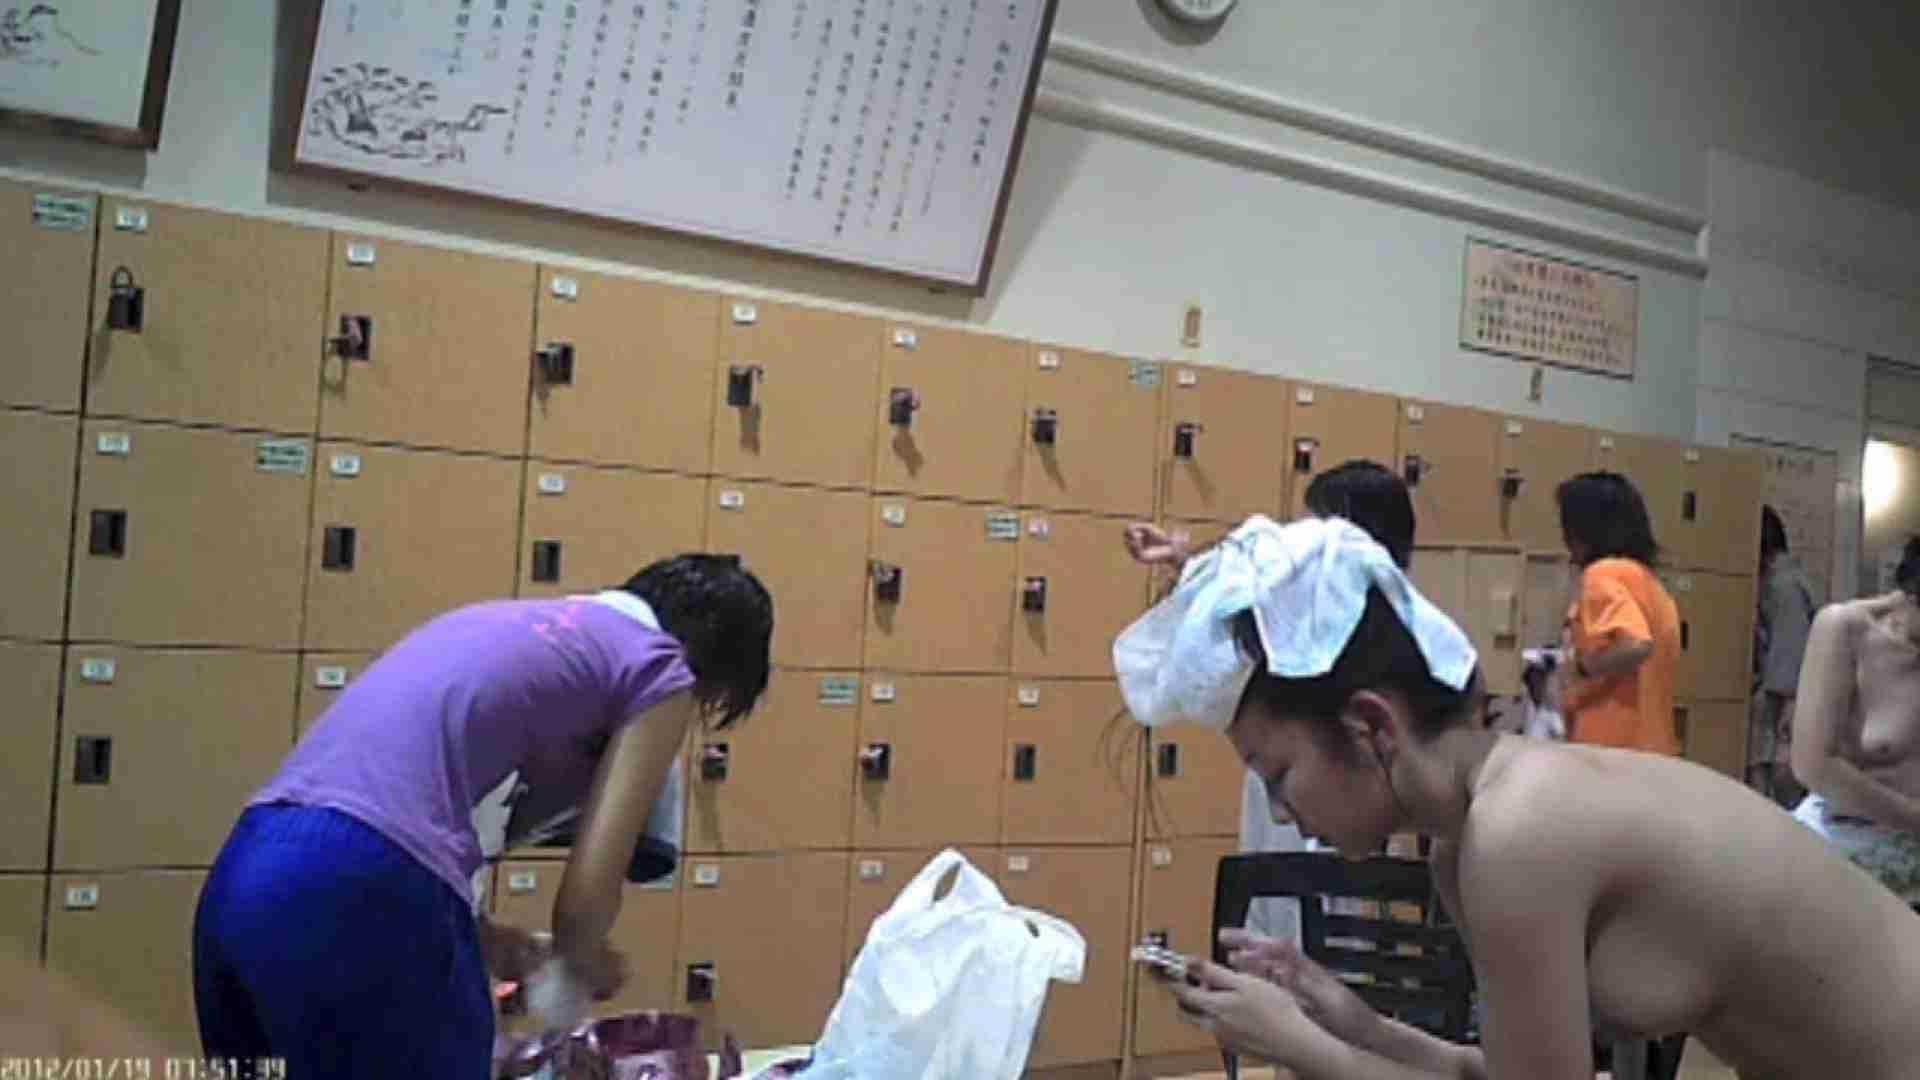 現役ギャル盗撮師 hana様の女風呂潜入撮!Vol.2 銭湯 | 盗撮  91pic 47